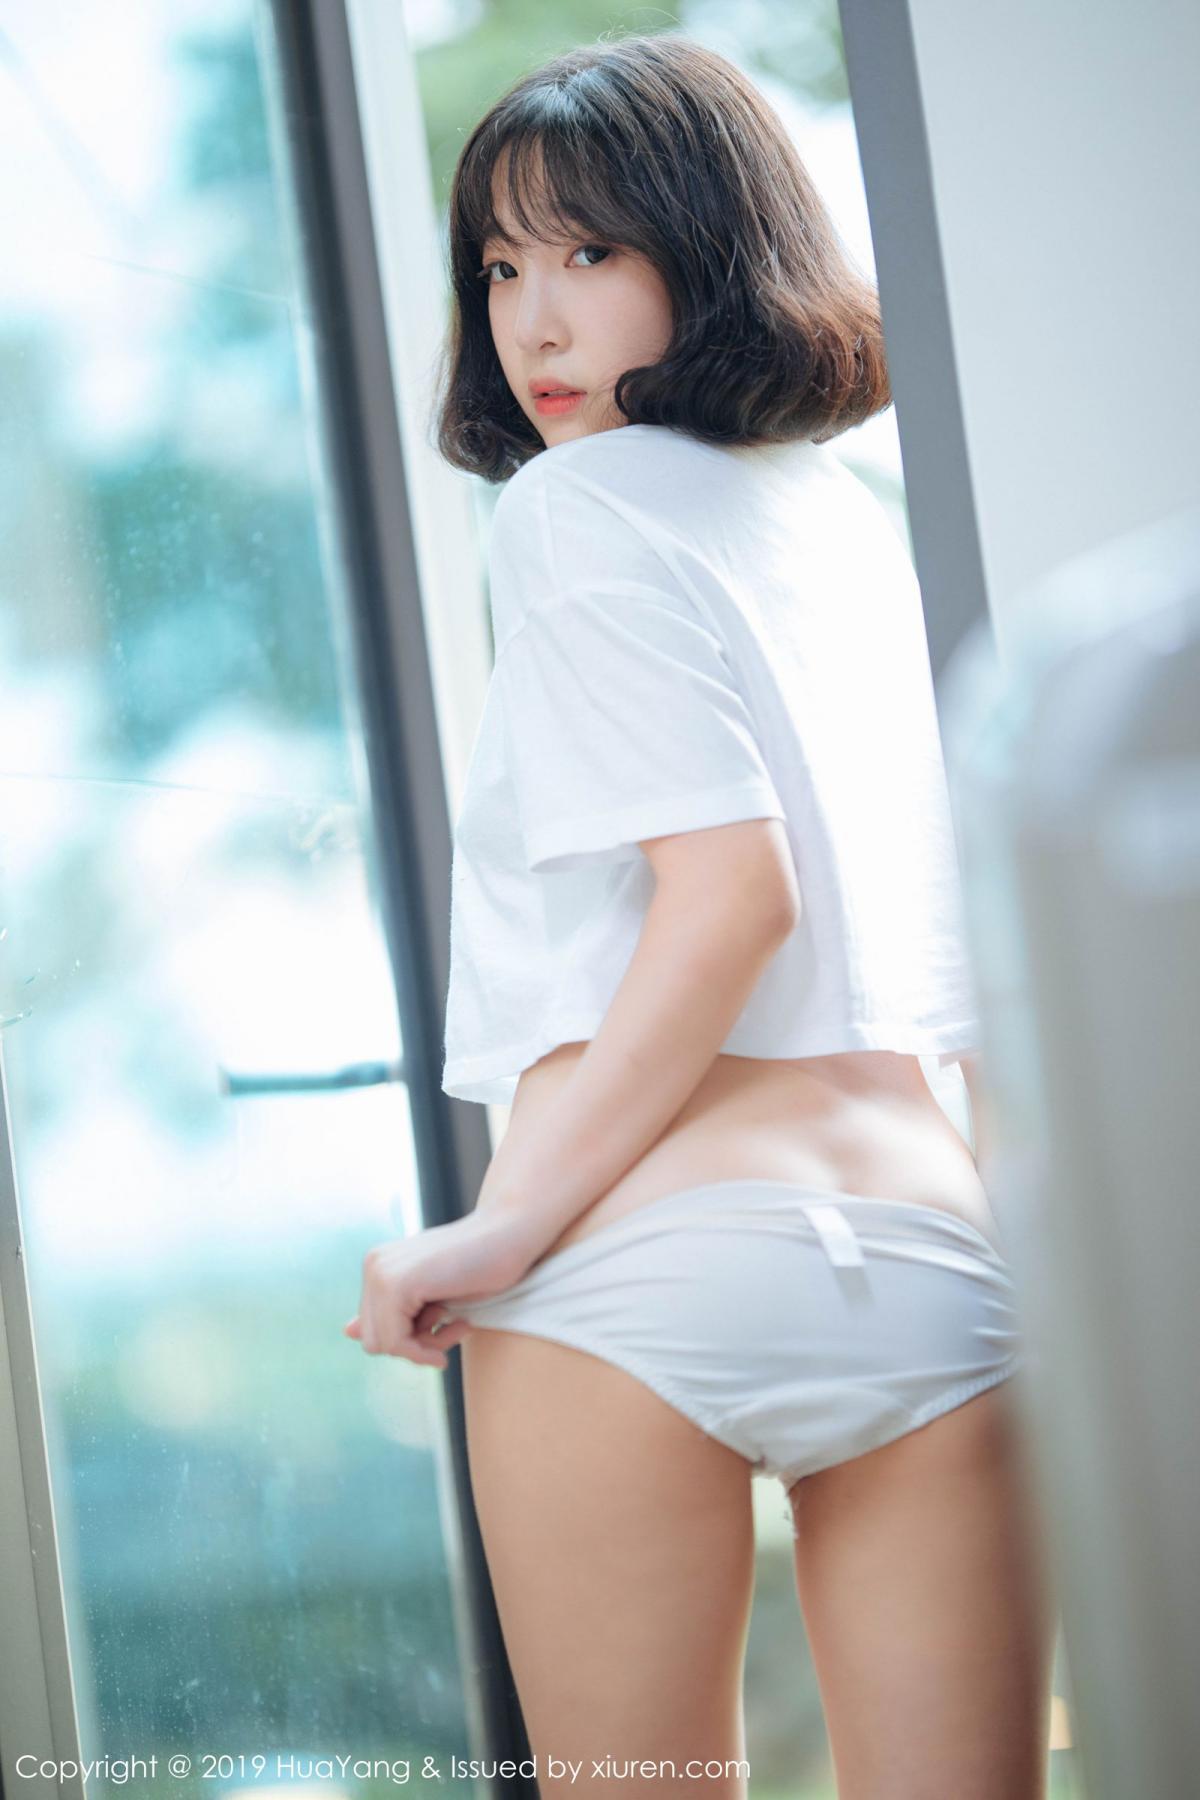 [Huayang] Vol.109 Kang In Kyung 11P, Cool, Fair Skin, HuaYang, Kang In Kyung